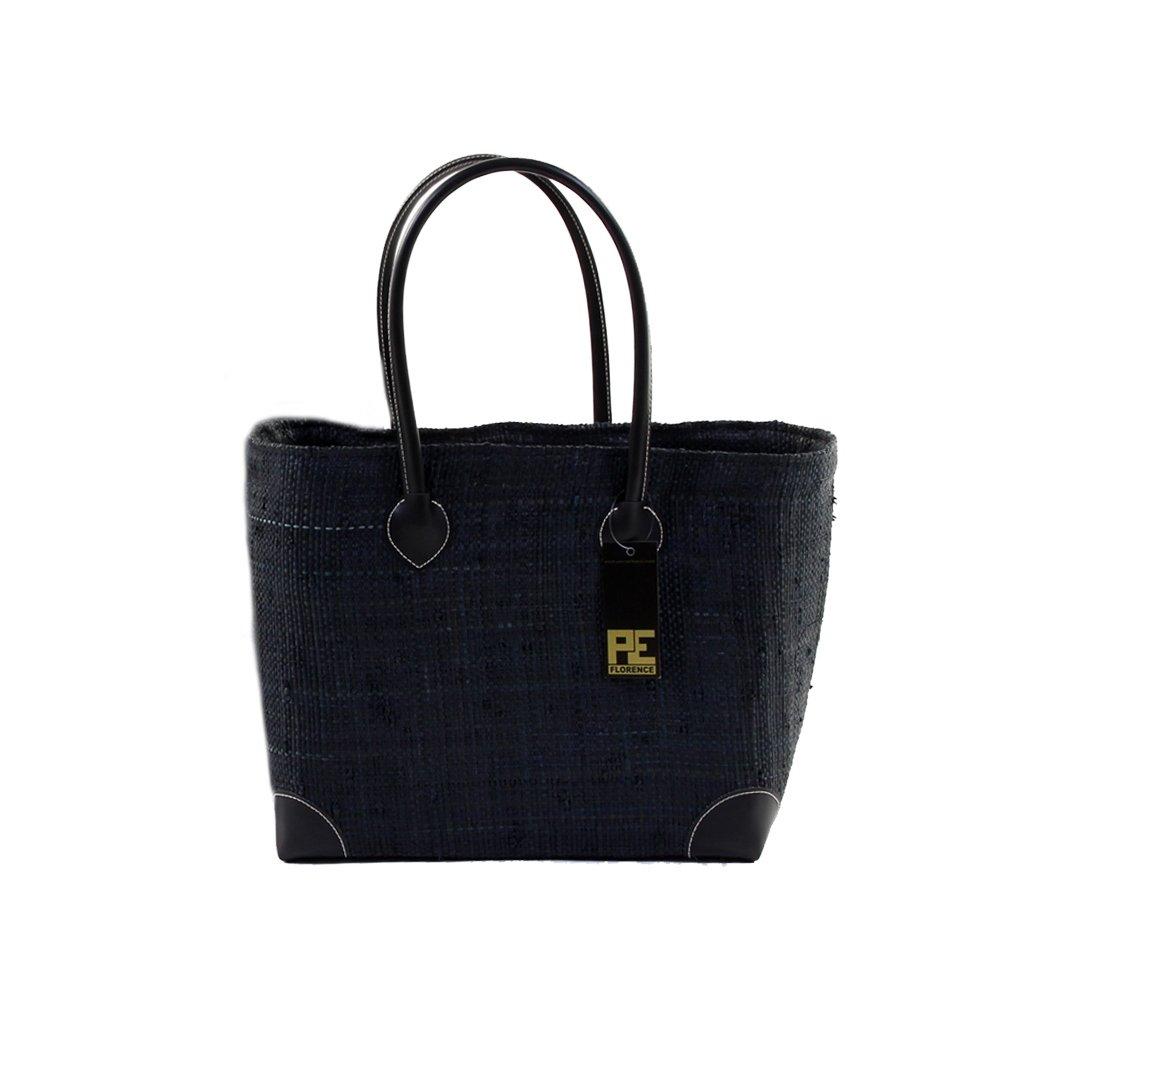 PE Florence Korbtasche Hangara Black XL Einkaufskorb Gr